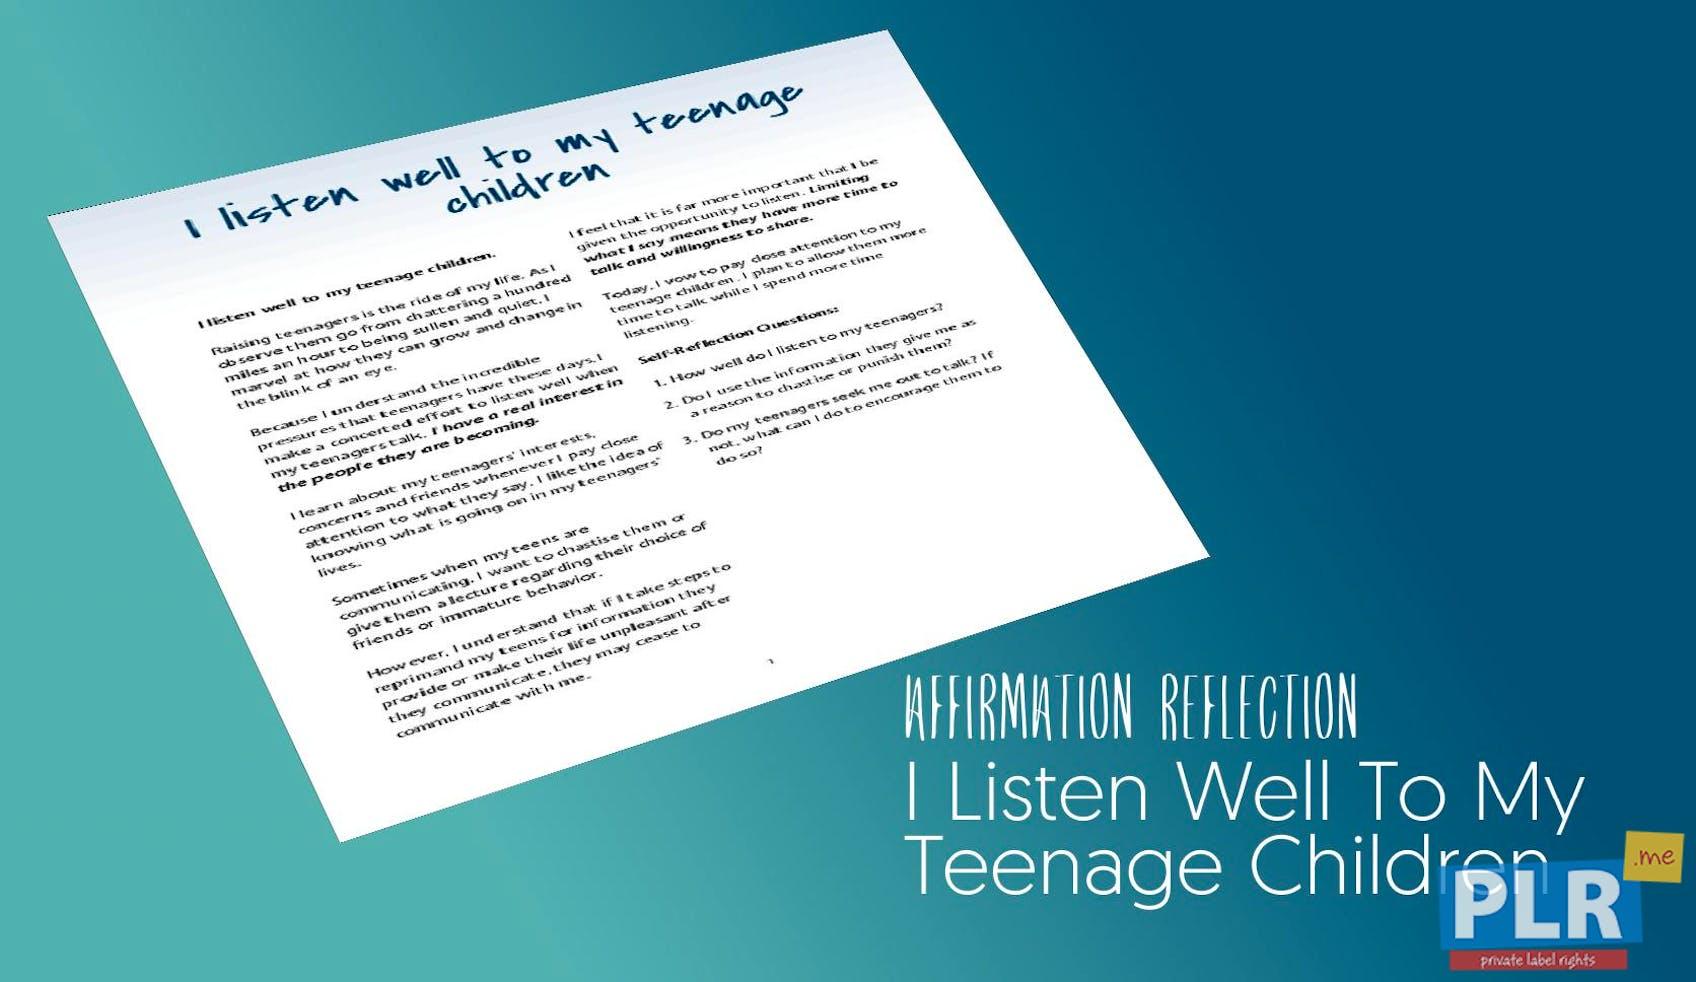 I Listen Well To My Teenage Children